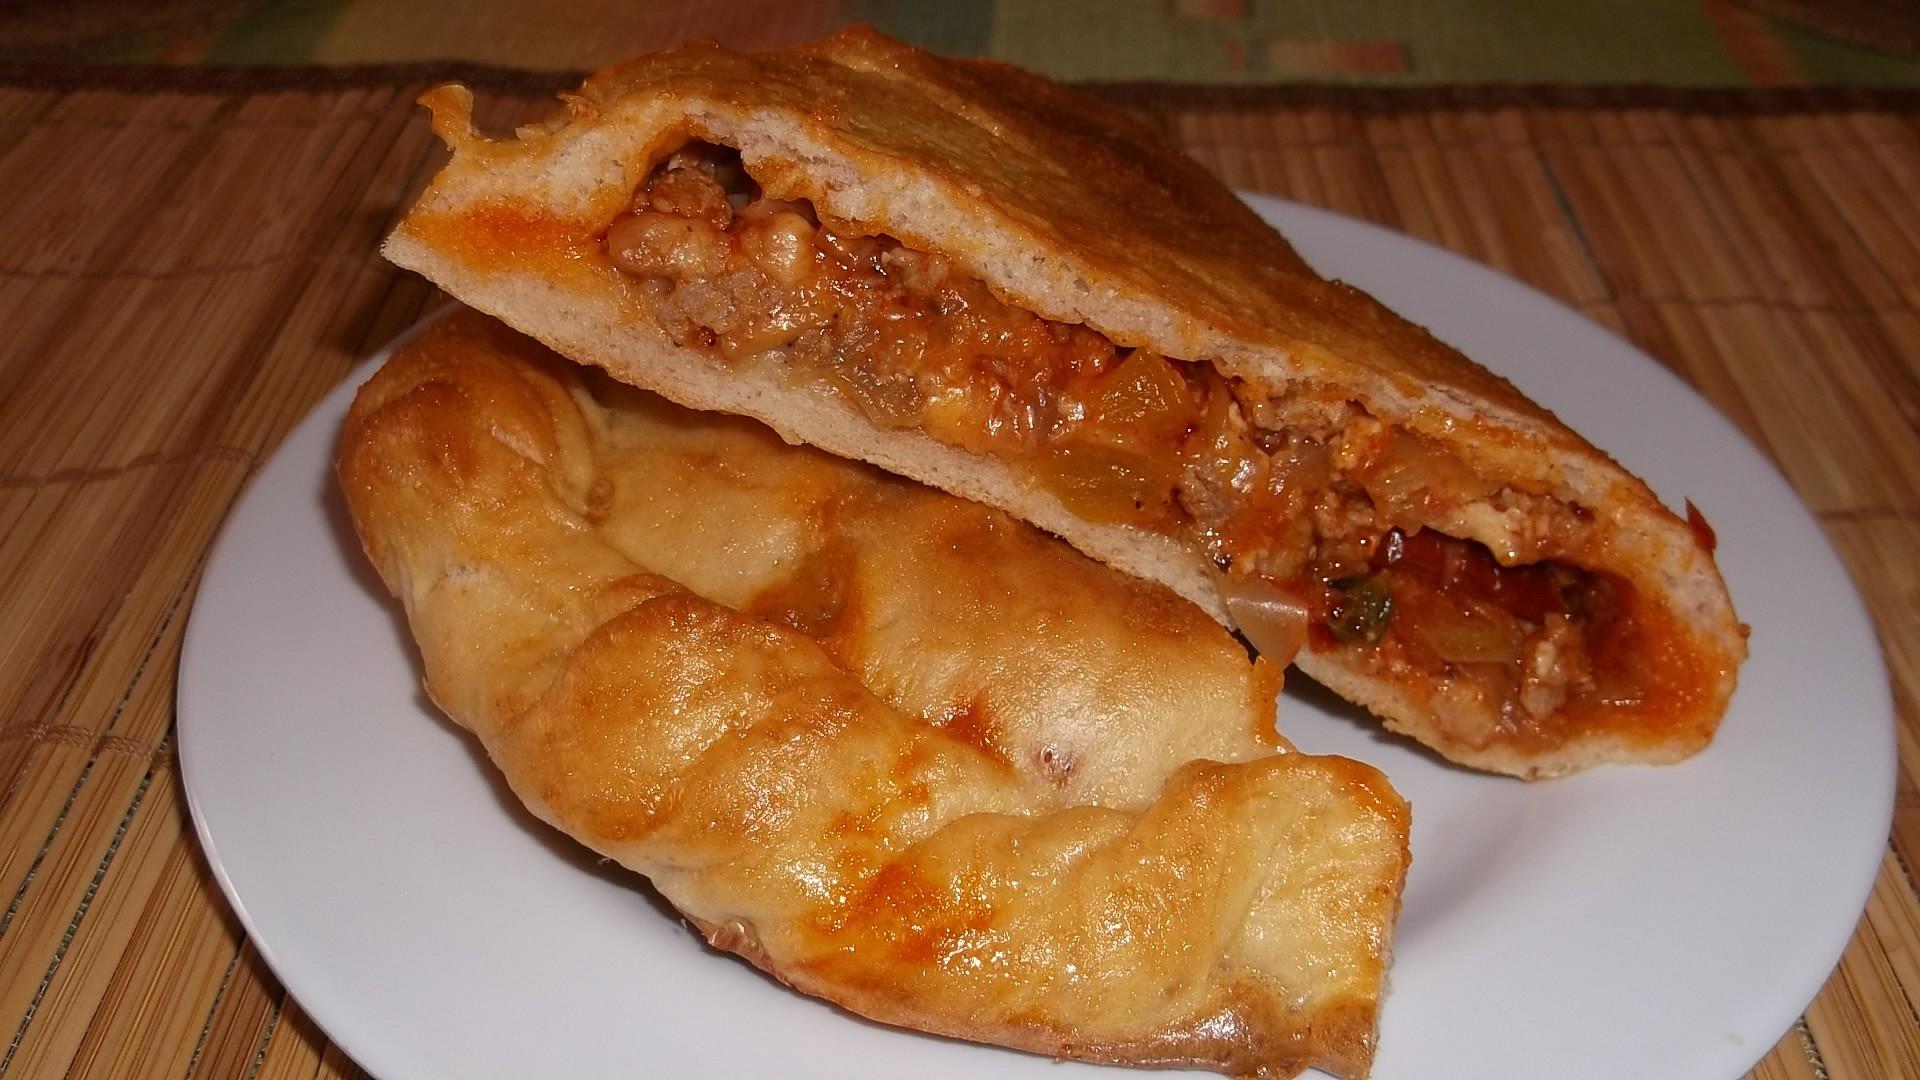 Calzone s mletým masem, paprikou, sušenými rajčaty a sýrem